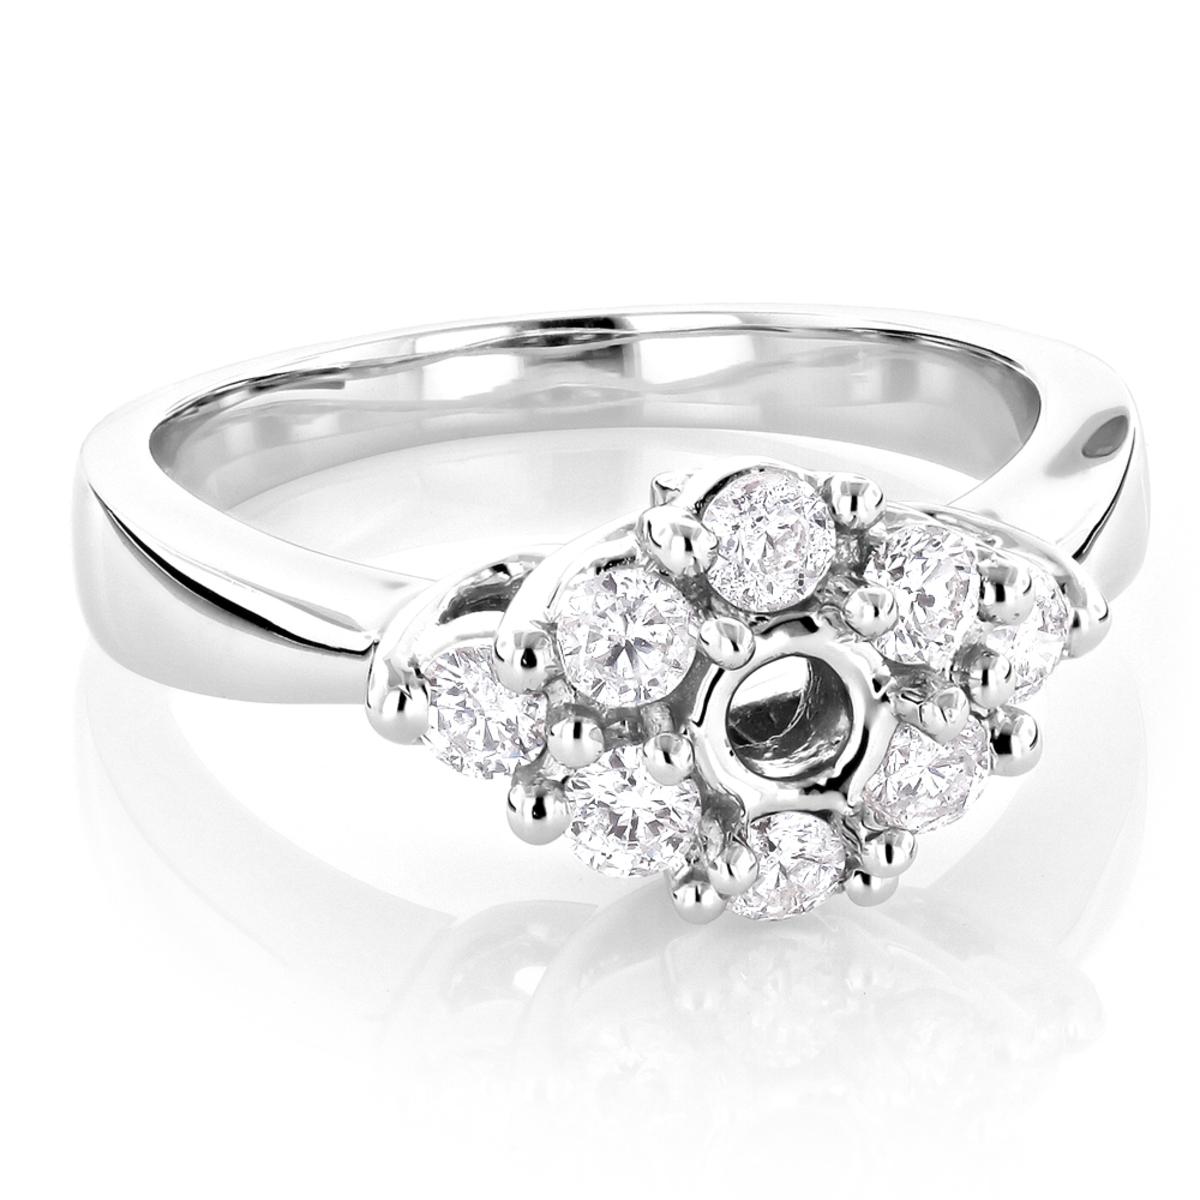 Halo 14K Gold Diamond Engagement Ring Setting 0.78ct